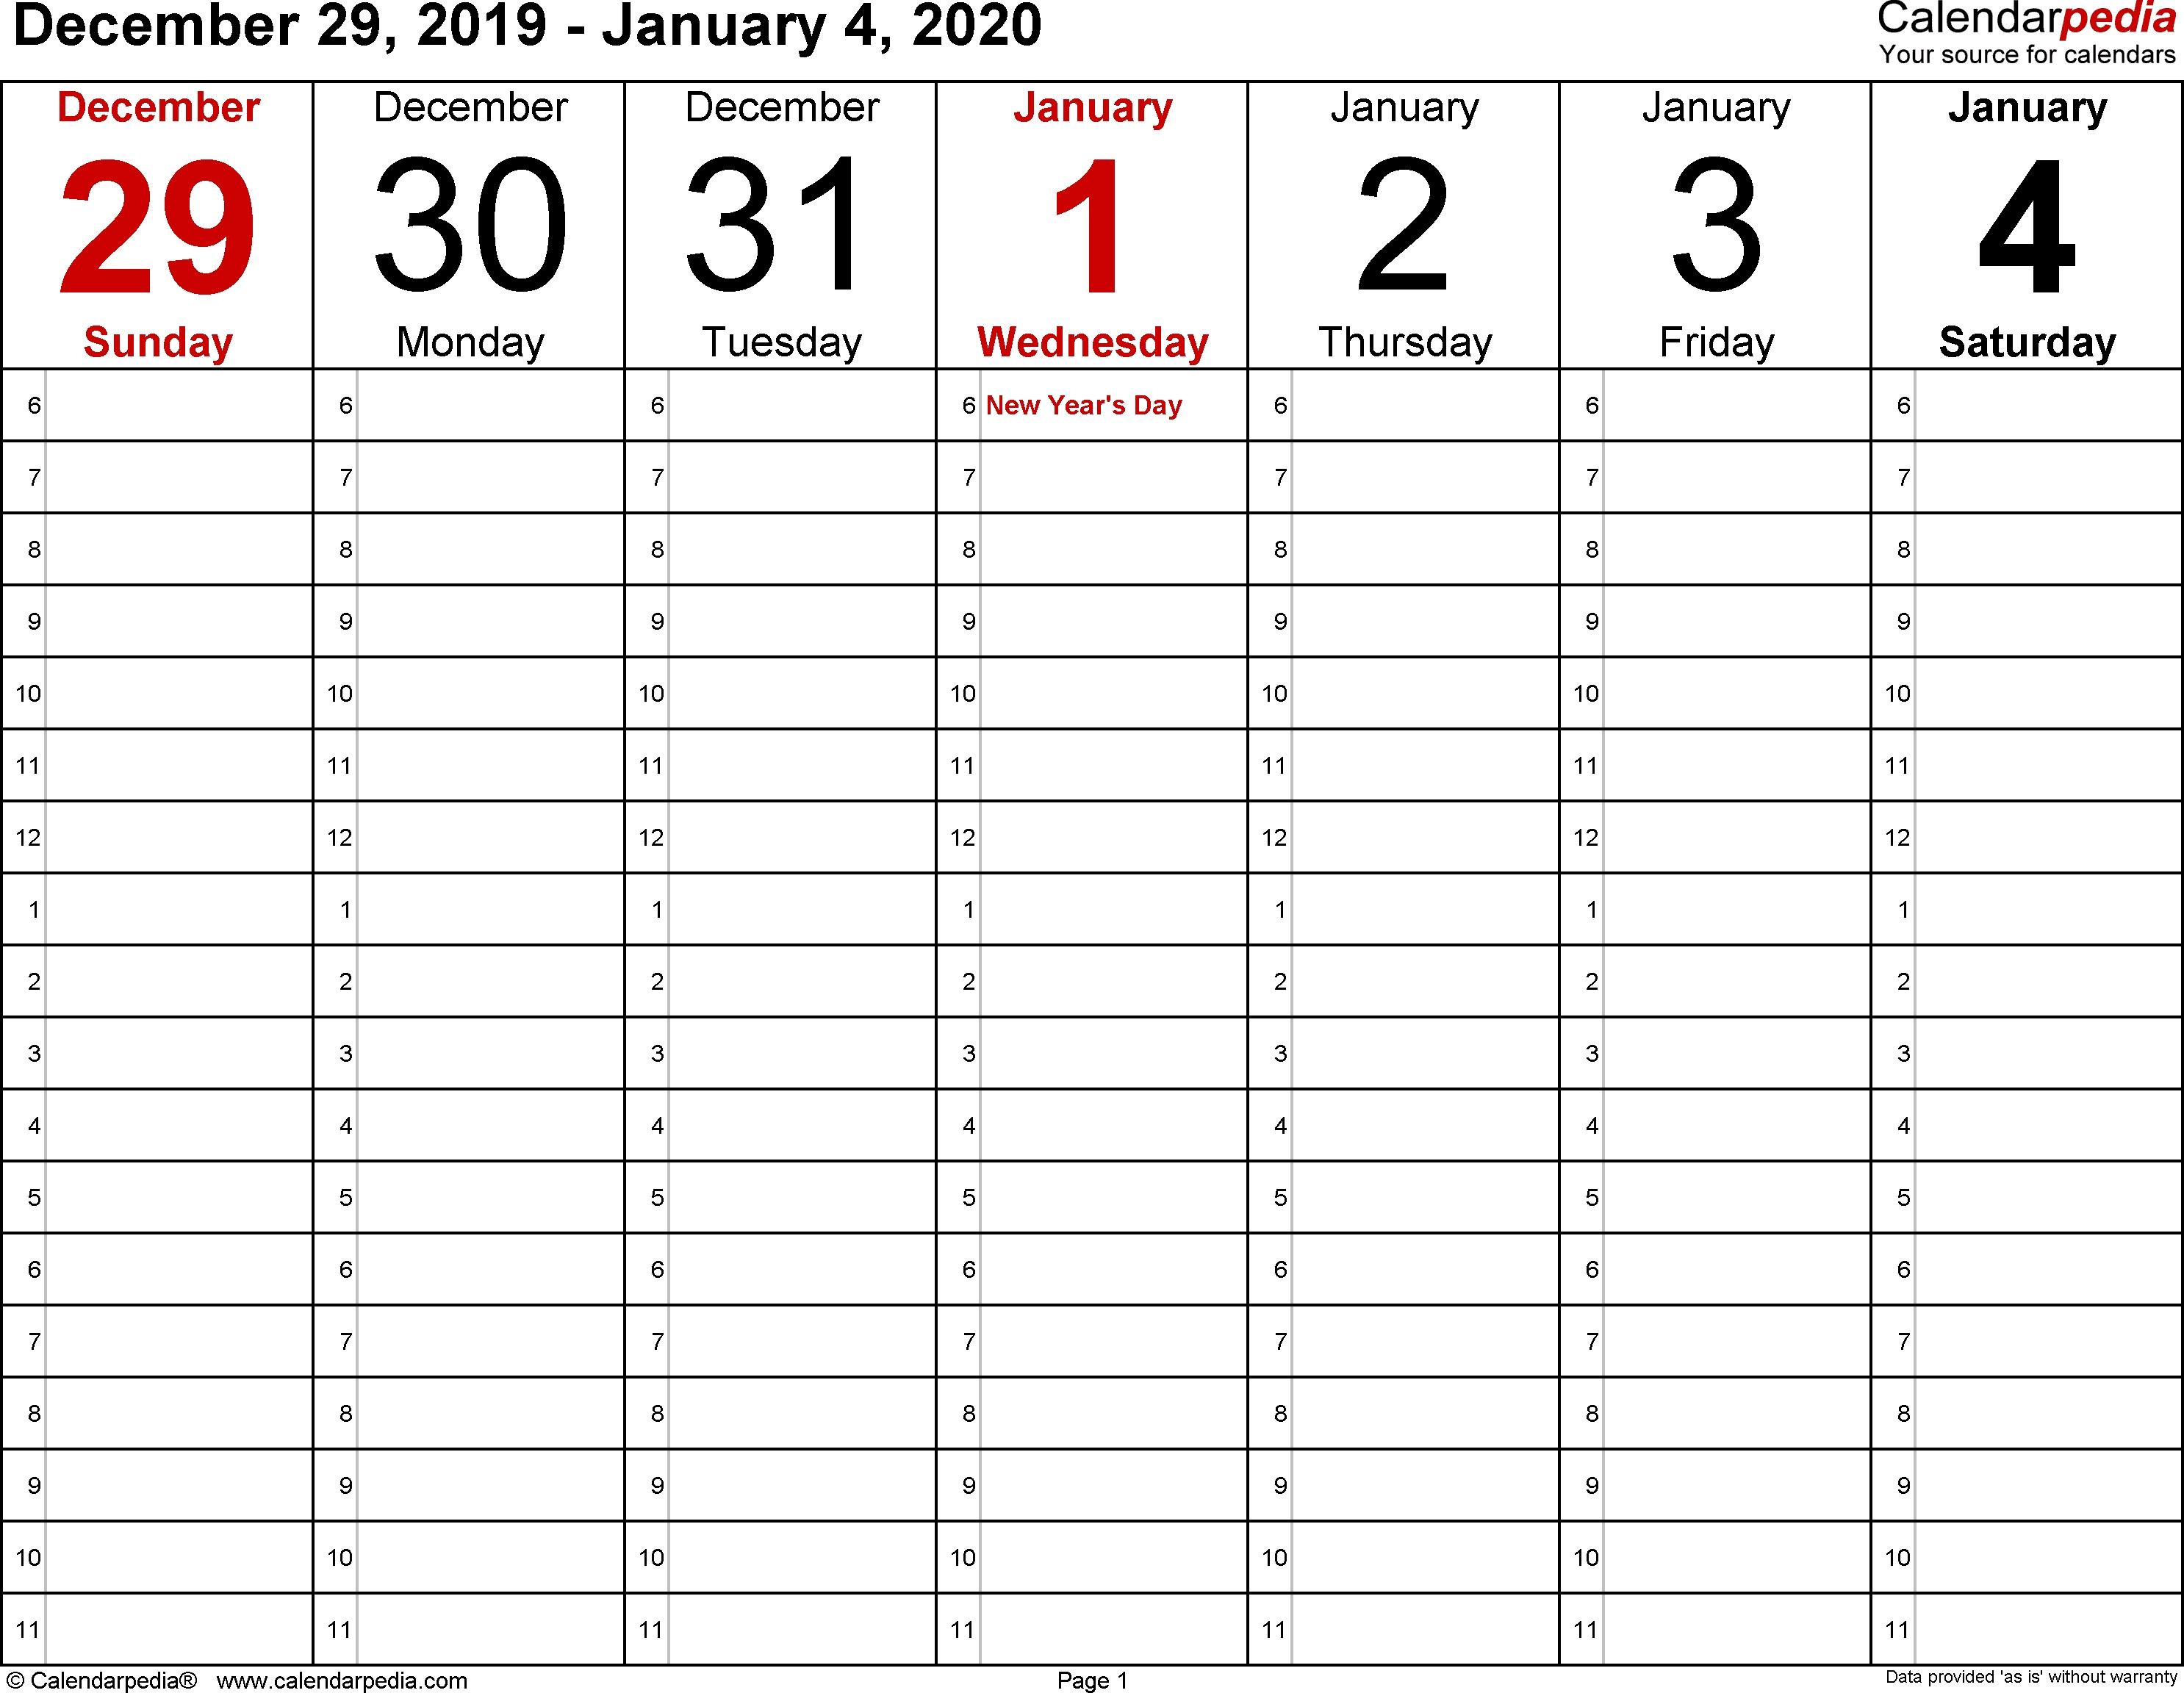 8.5 X 11 Calander Filler For 2020 - Calendar Inspiration Design within 8.5 X 11 Calendar Template